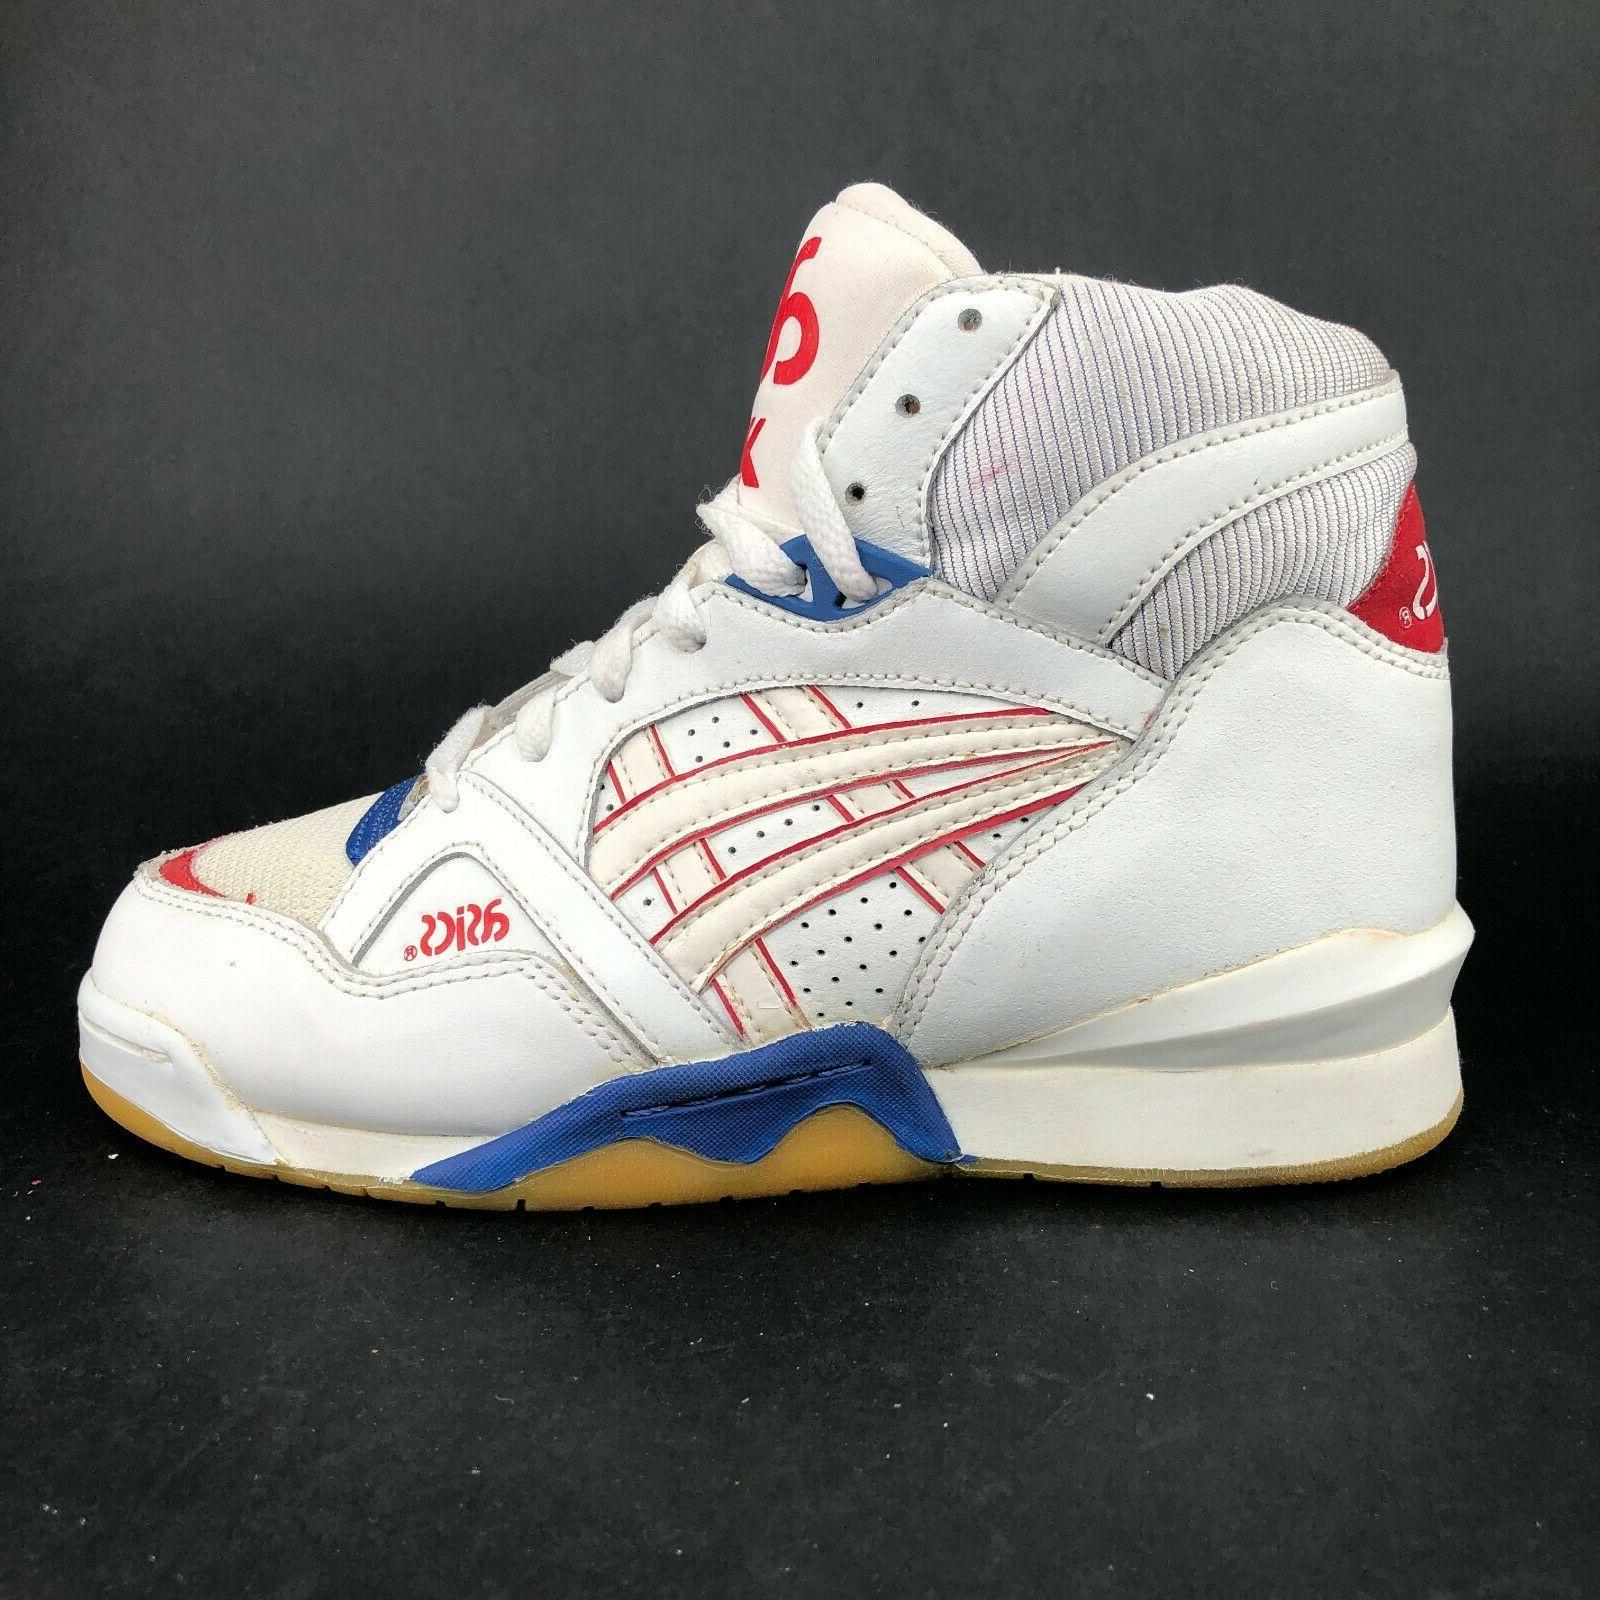 ASICS White High Basketball Sneakers Ups